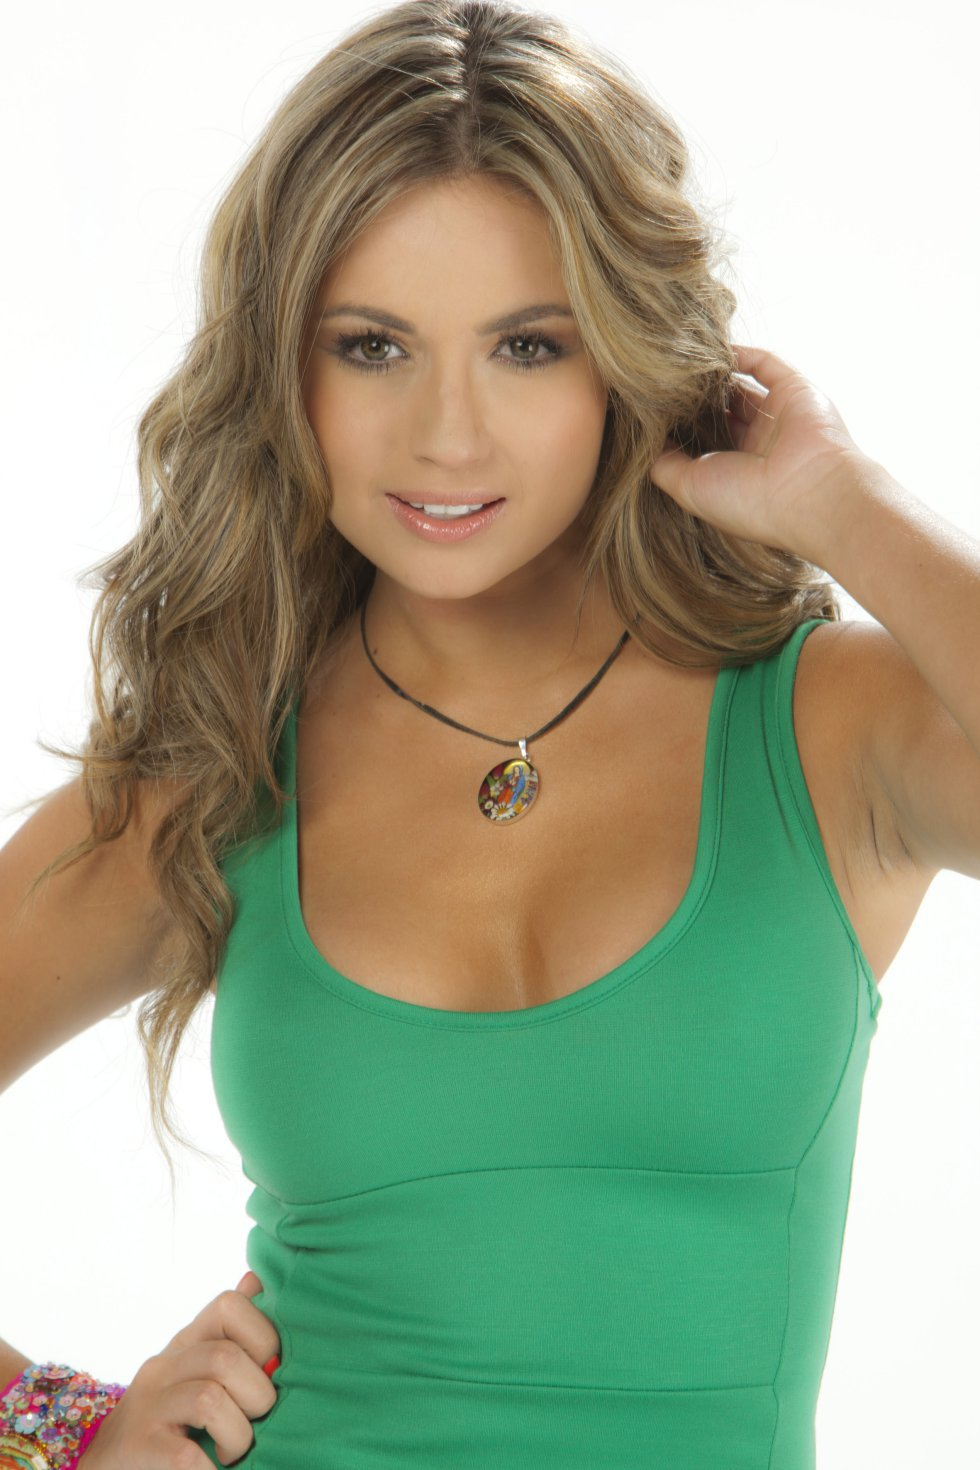 Es comunicadora social, modelo y presentadora.